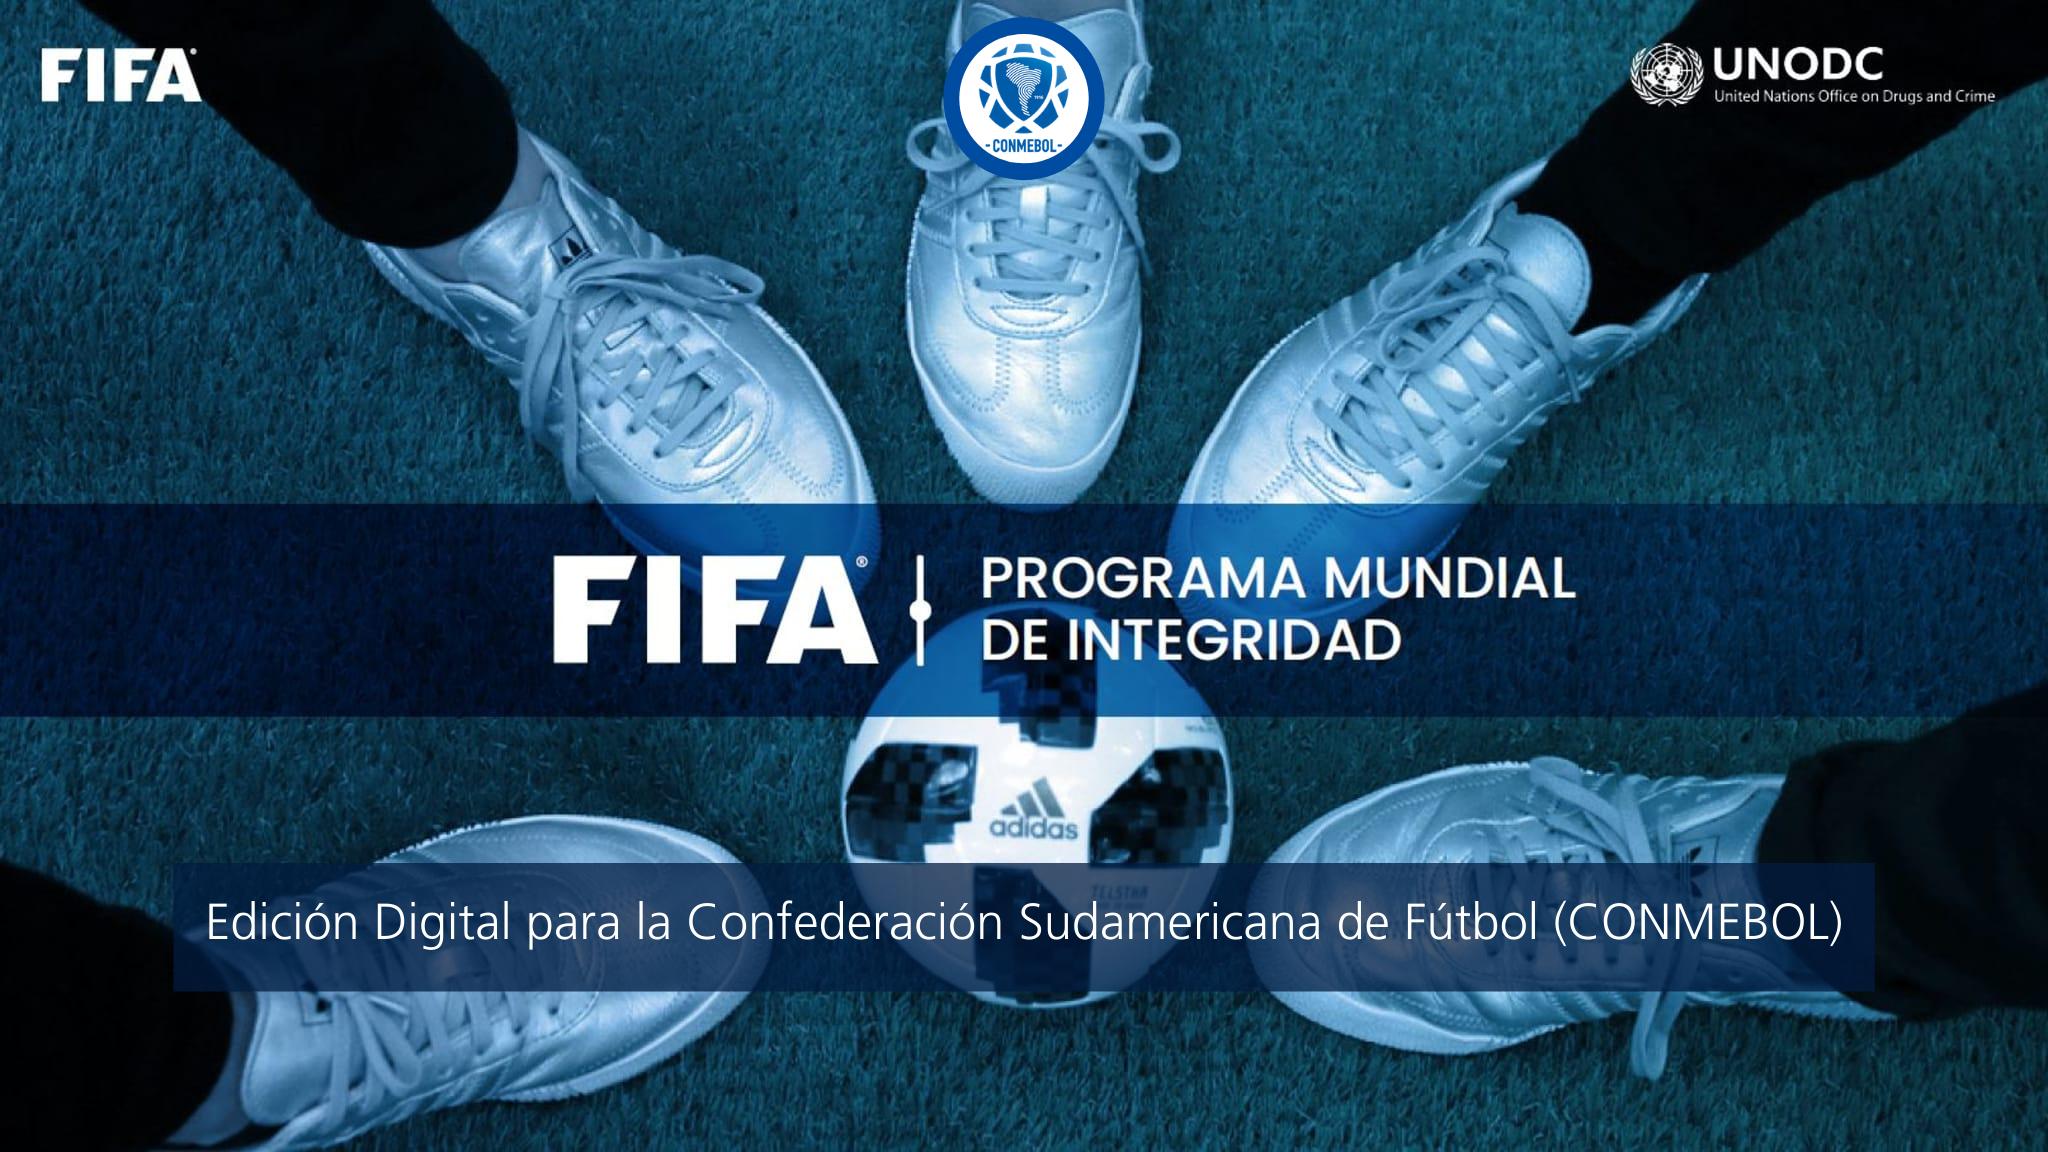 CONMEBOL member associations participate in FIFA International Integrity Programme